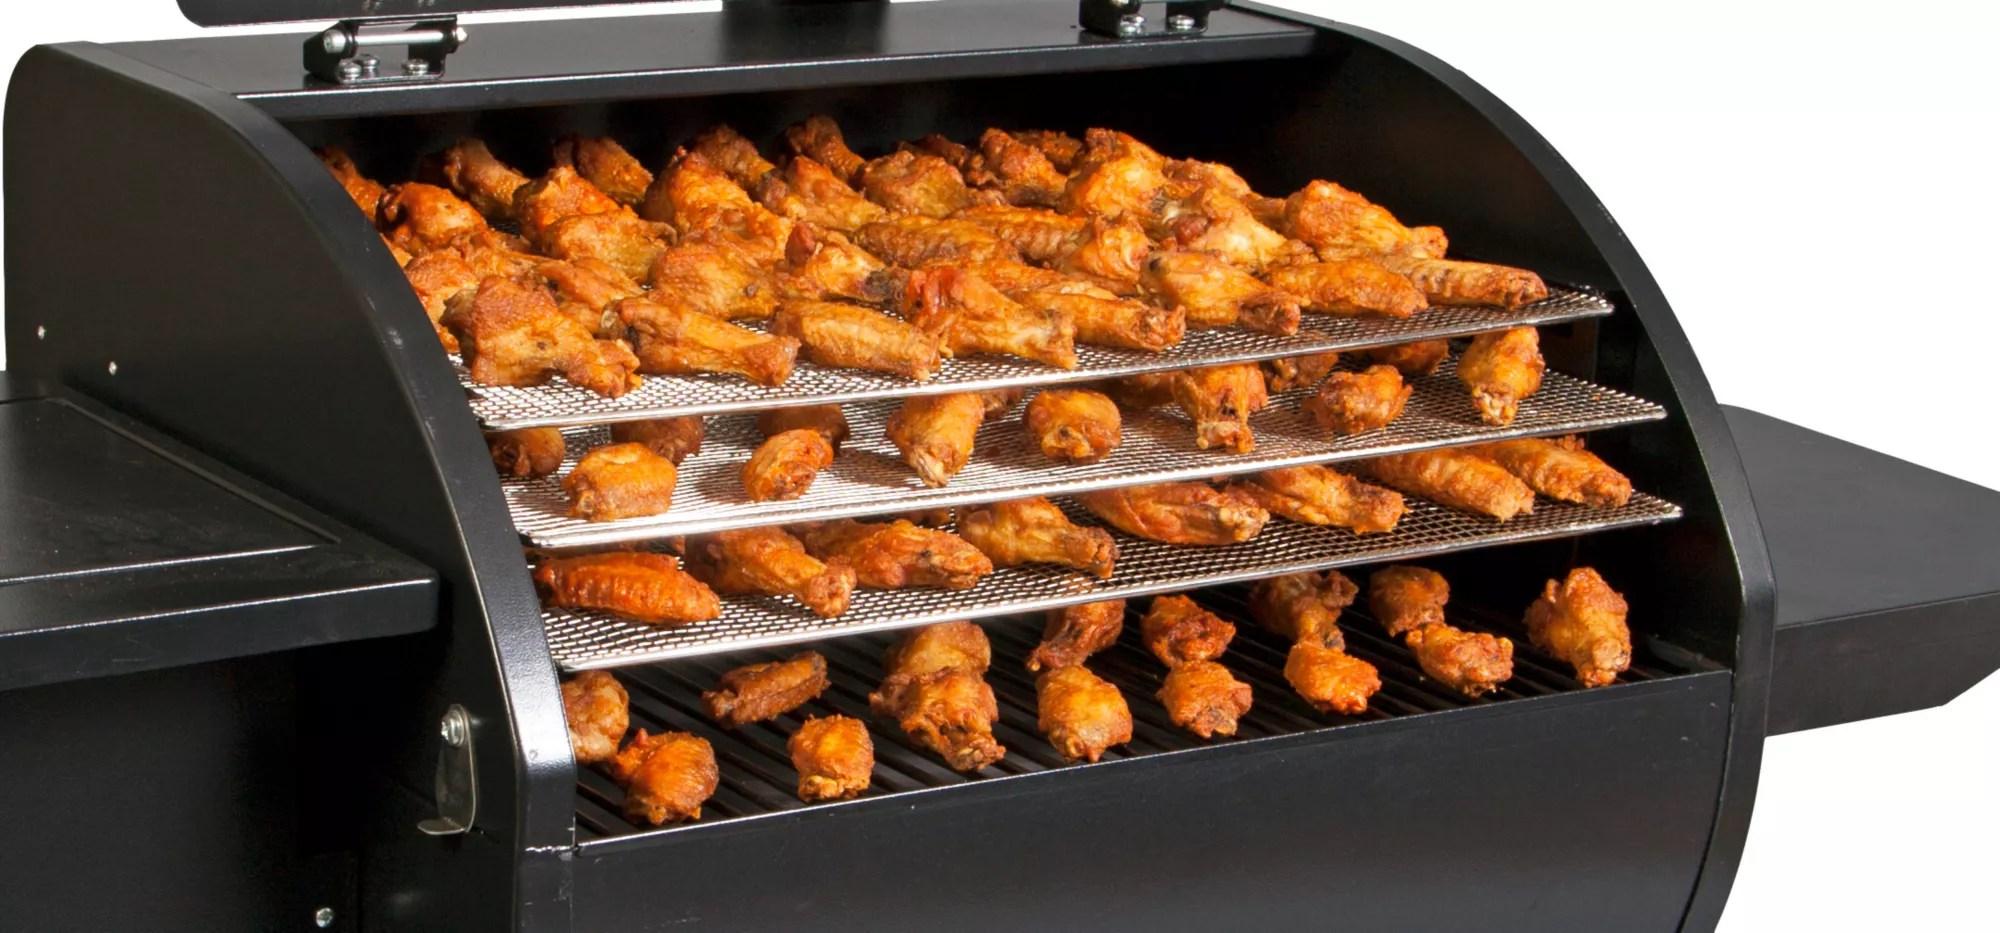 camp chef pellet grill jerky rack